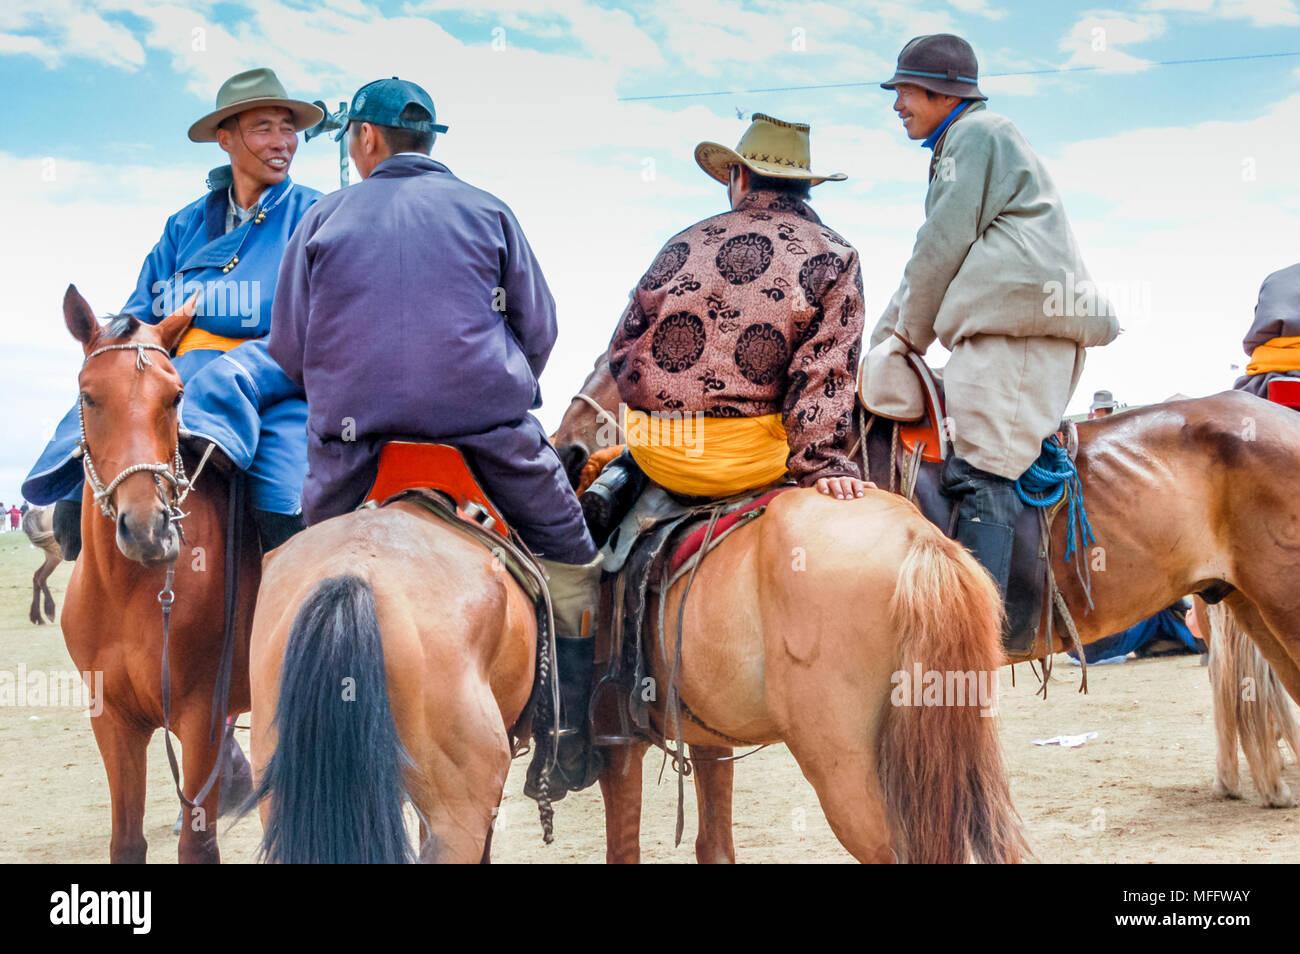 Khui Doloon Khudag, Mongolia - Luglio 12, 2010: cavalieri in costume tradizionale a Nadaam corsa di cavalli sulla steppa capitale esterno Ulaanbaatar Immagini Stock